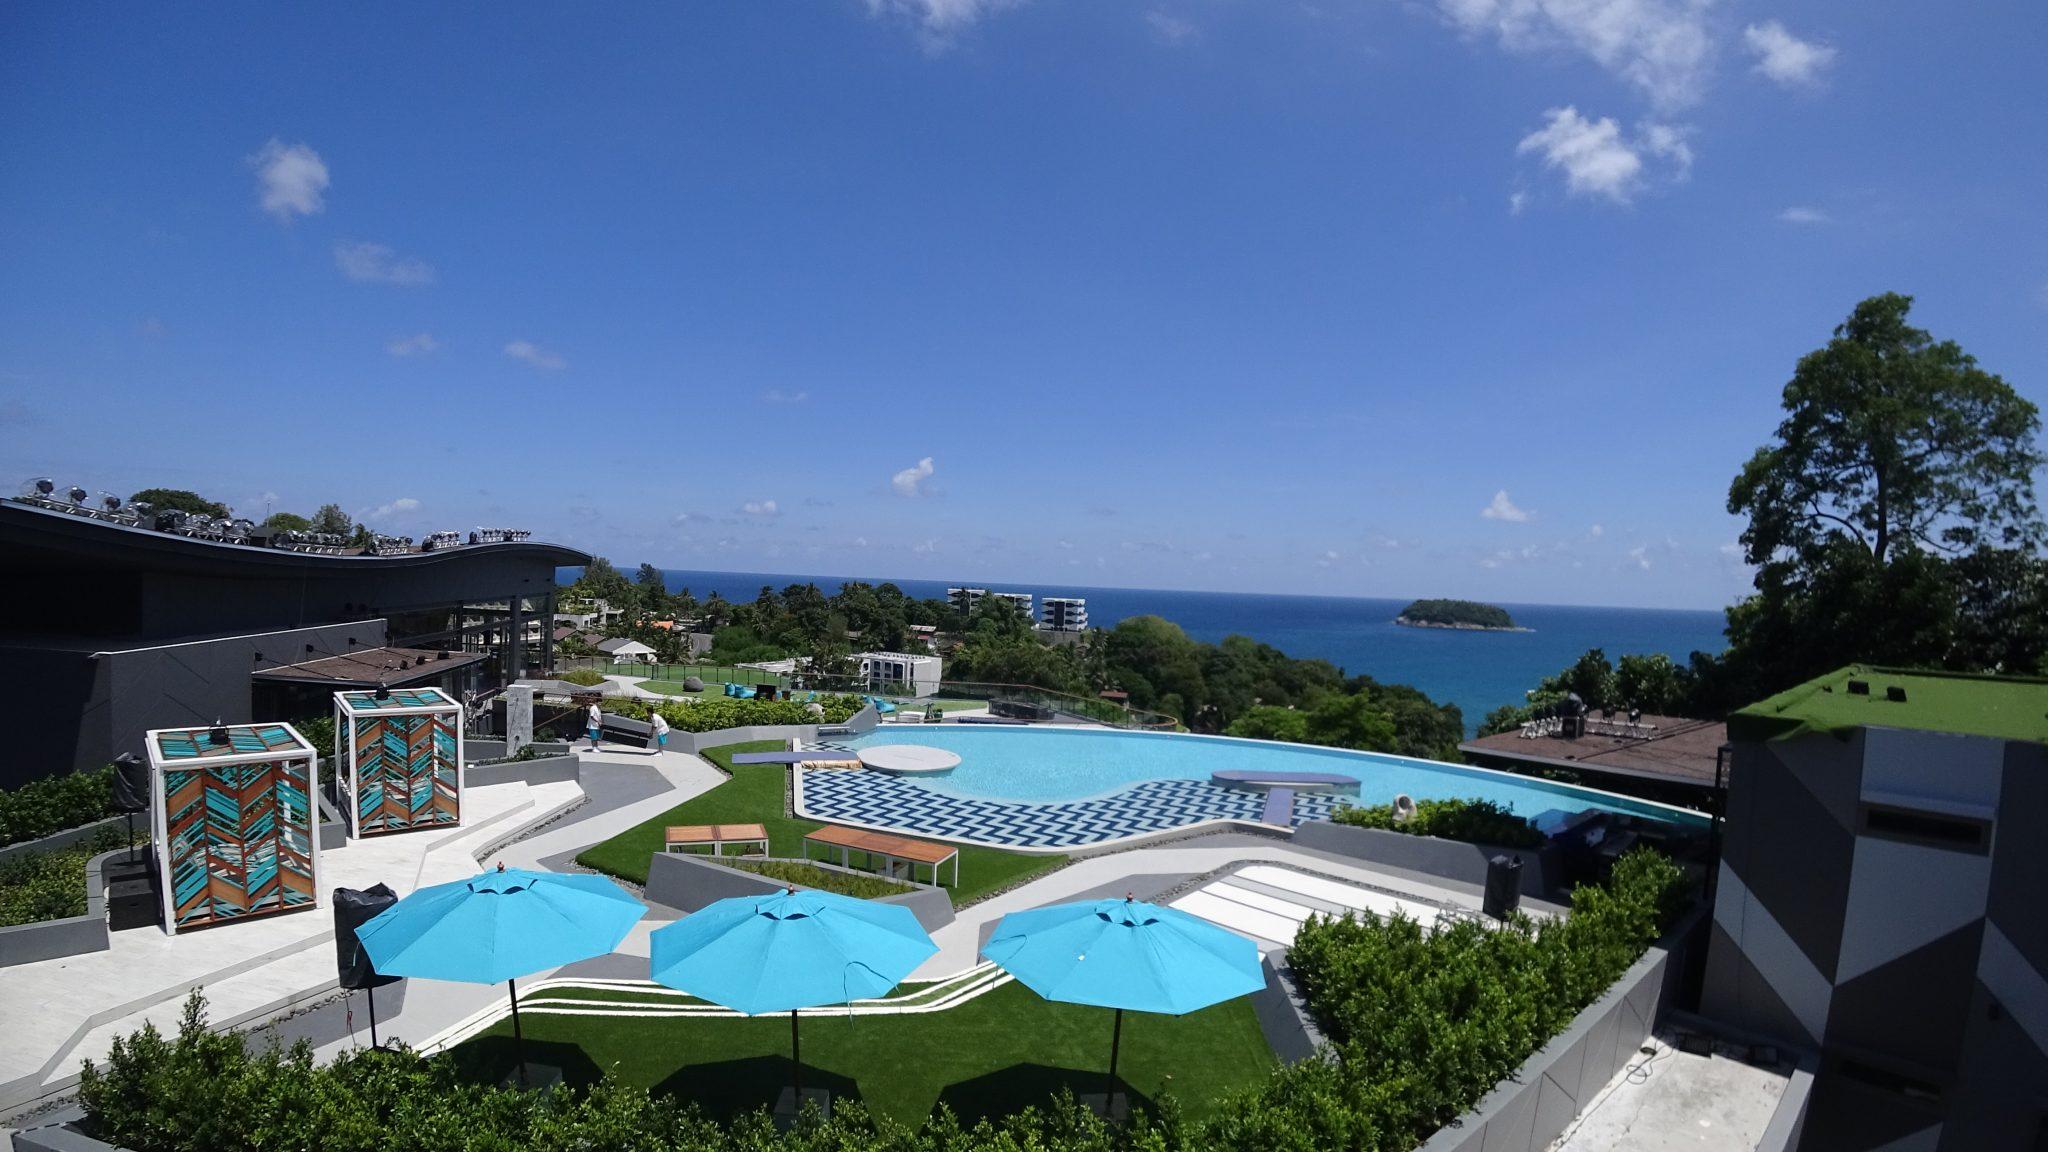 Stay In Style at The SIS Kata Resort, Phuket | เดอะ ซิส กะตะ รีสอร์ท, ภูเก็ต